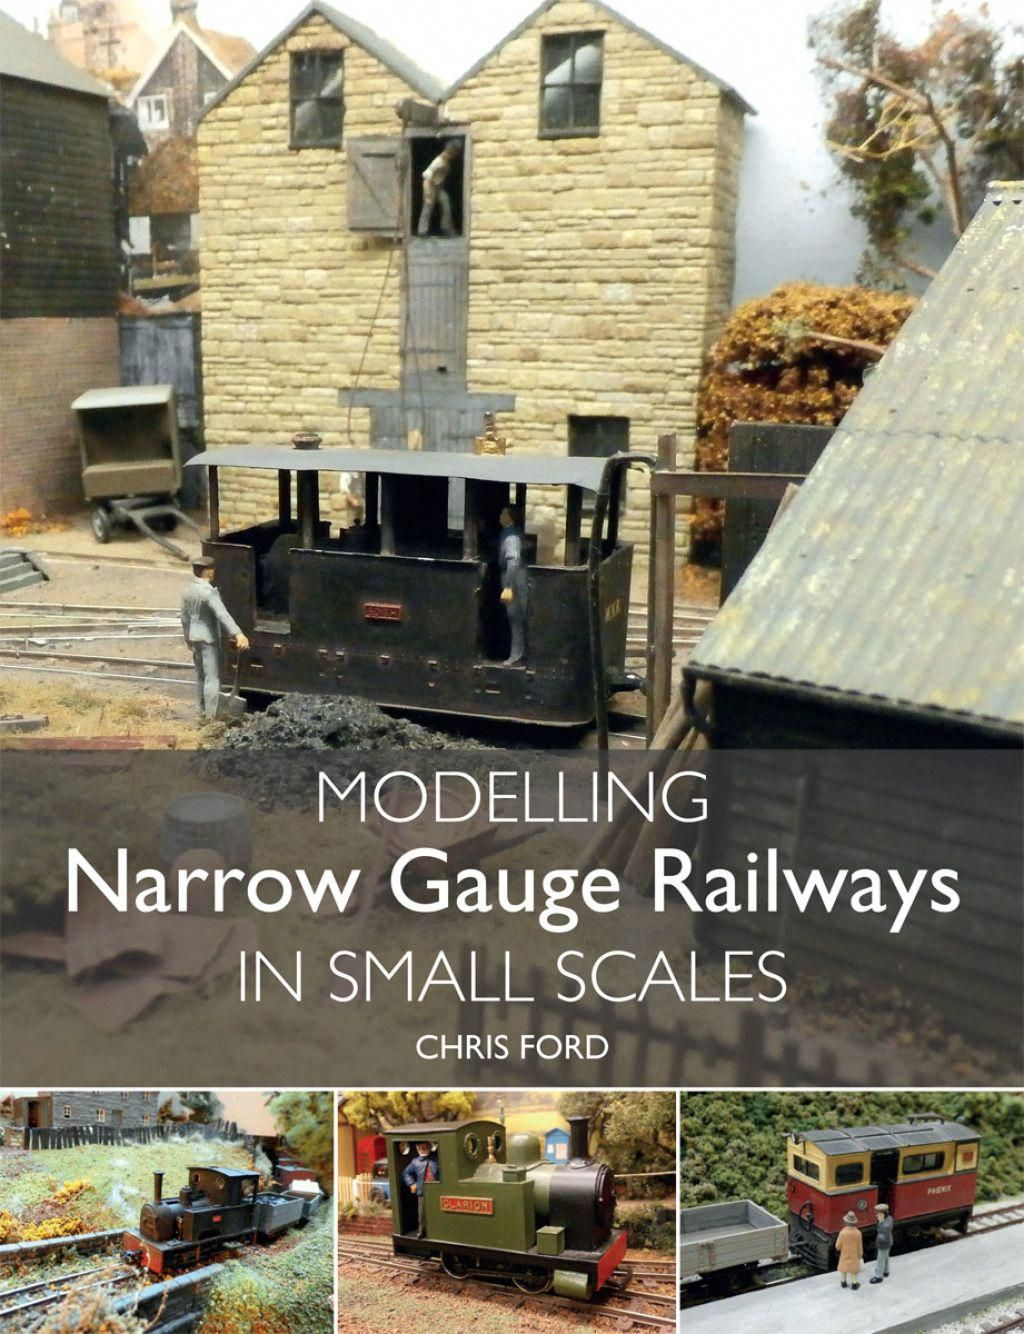 Modelling Narrow Gauge Railways In Small Scales Ebook Model Railway Model Trains Toy Trains Set